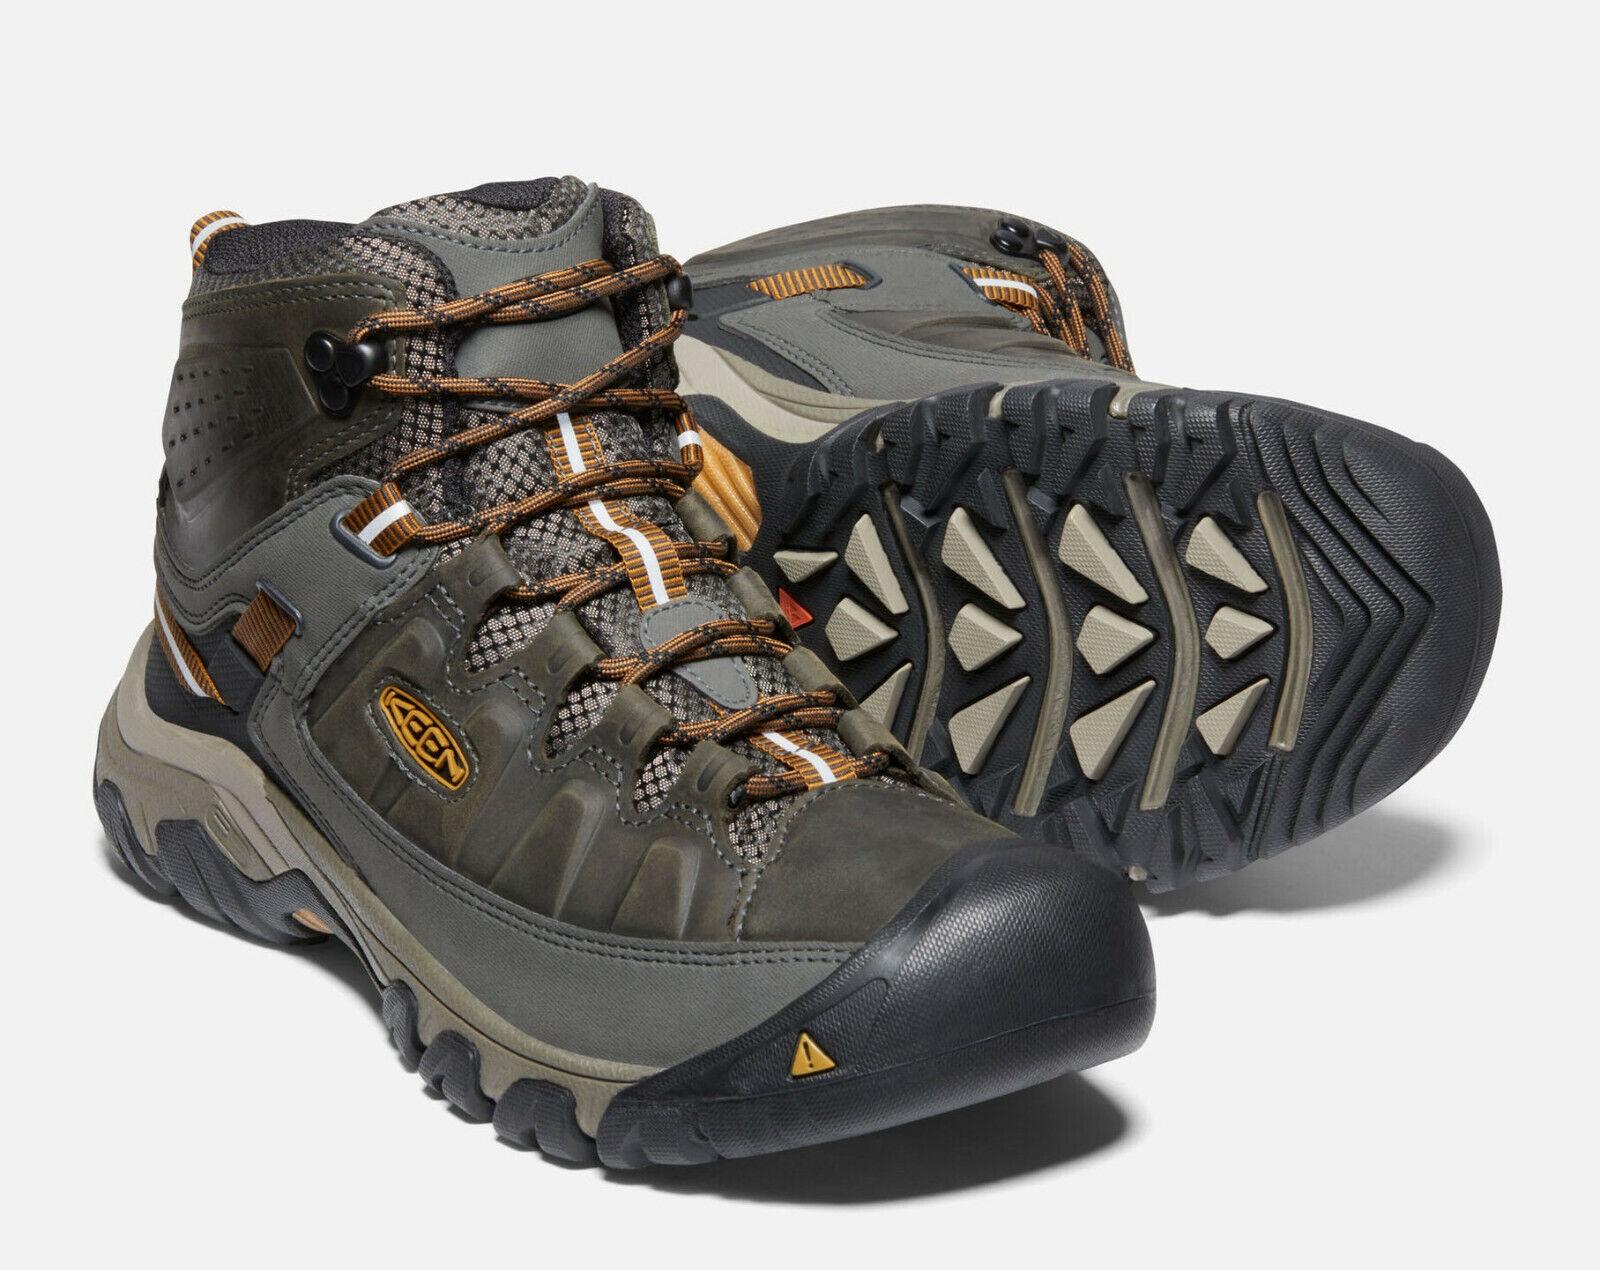 Dry Waterproof Hiking BOOTS